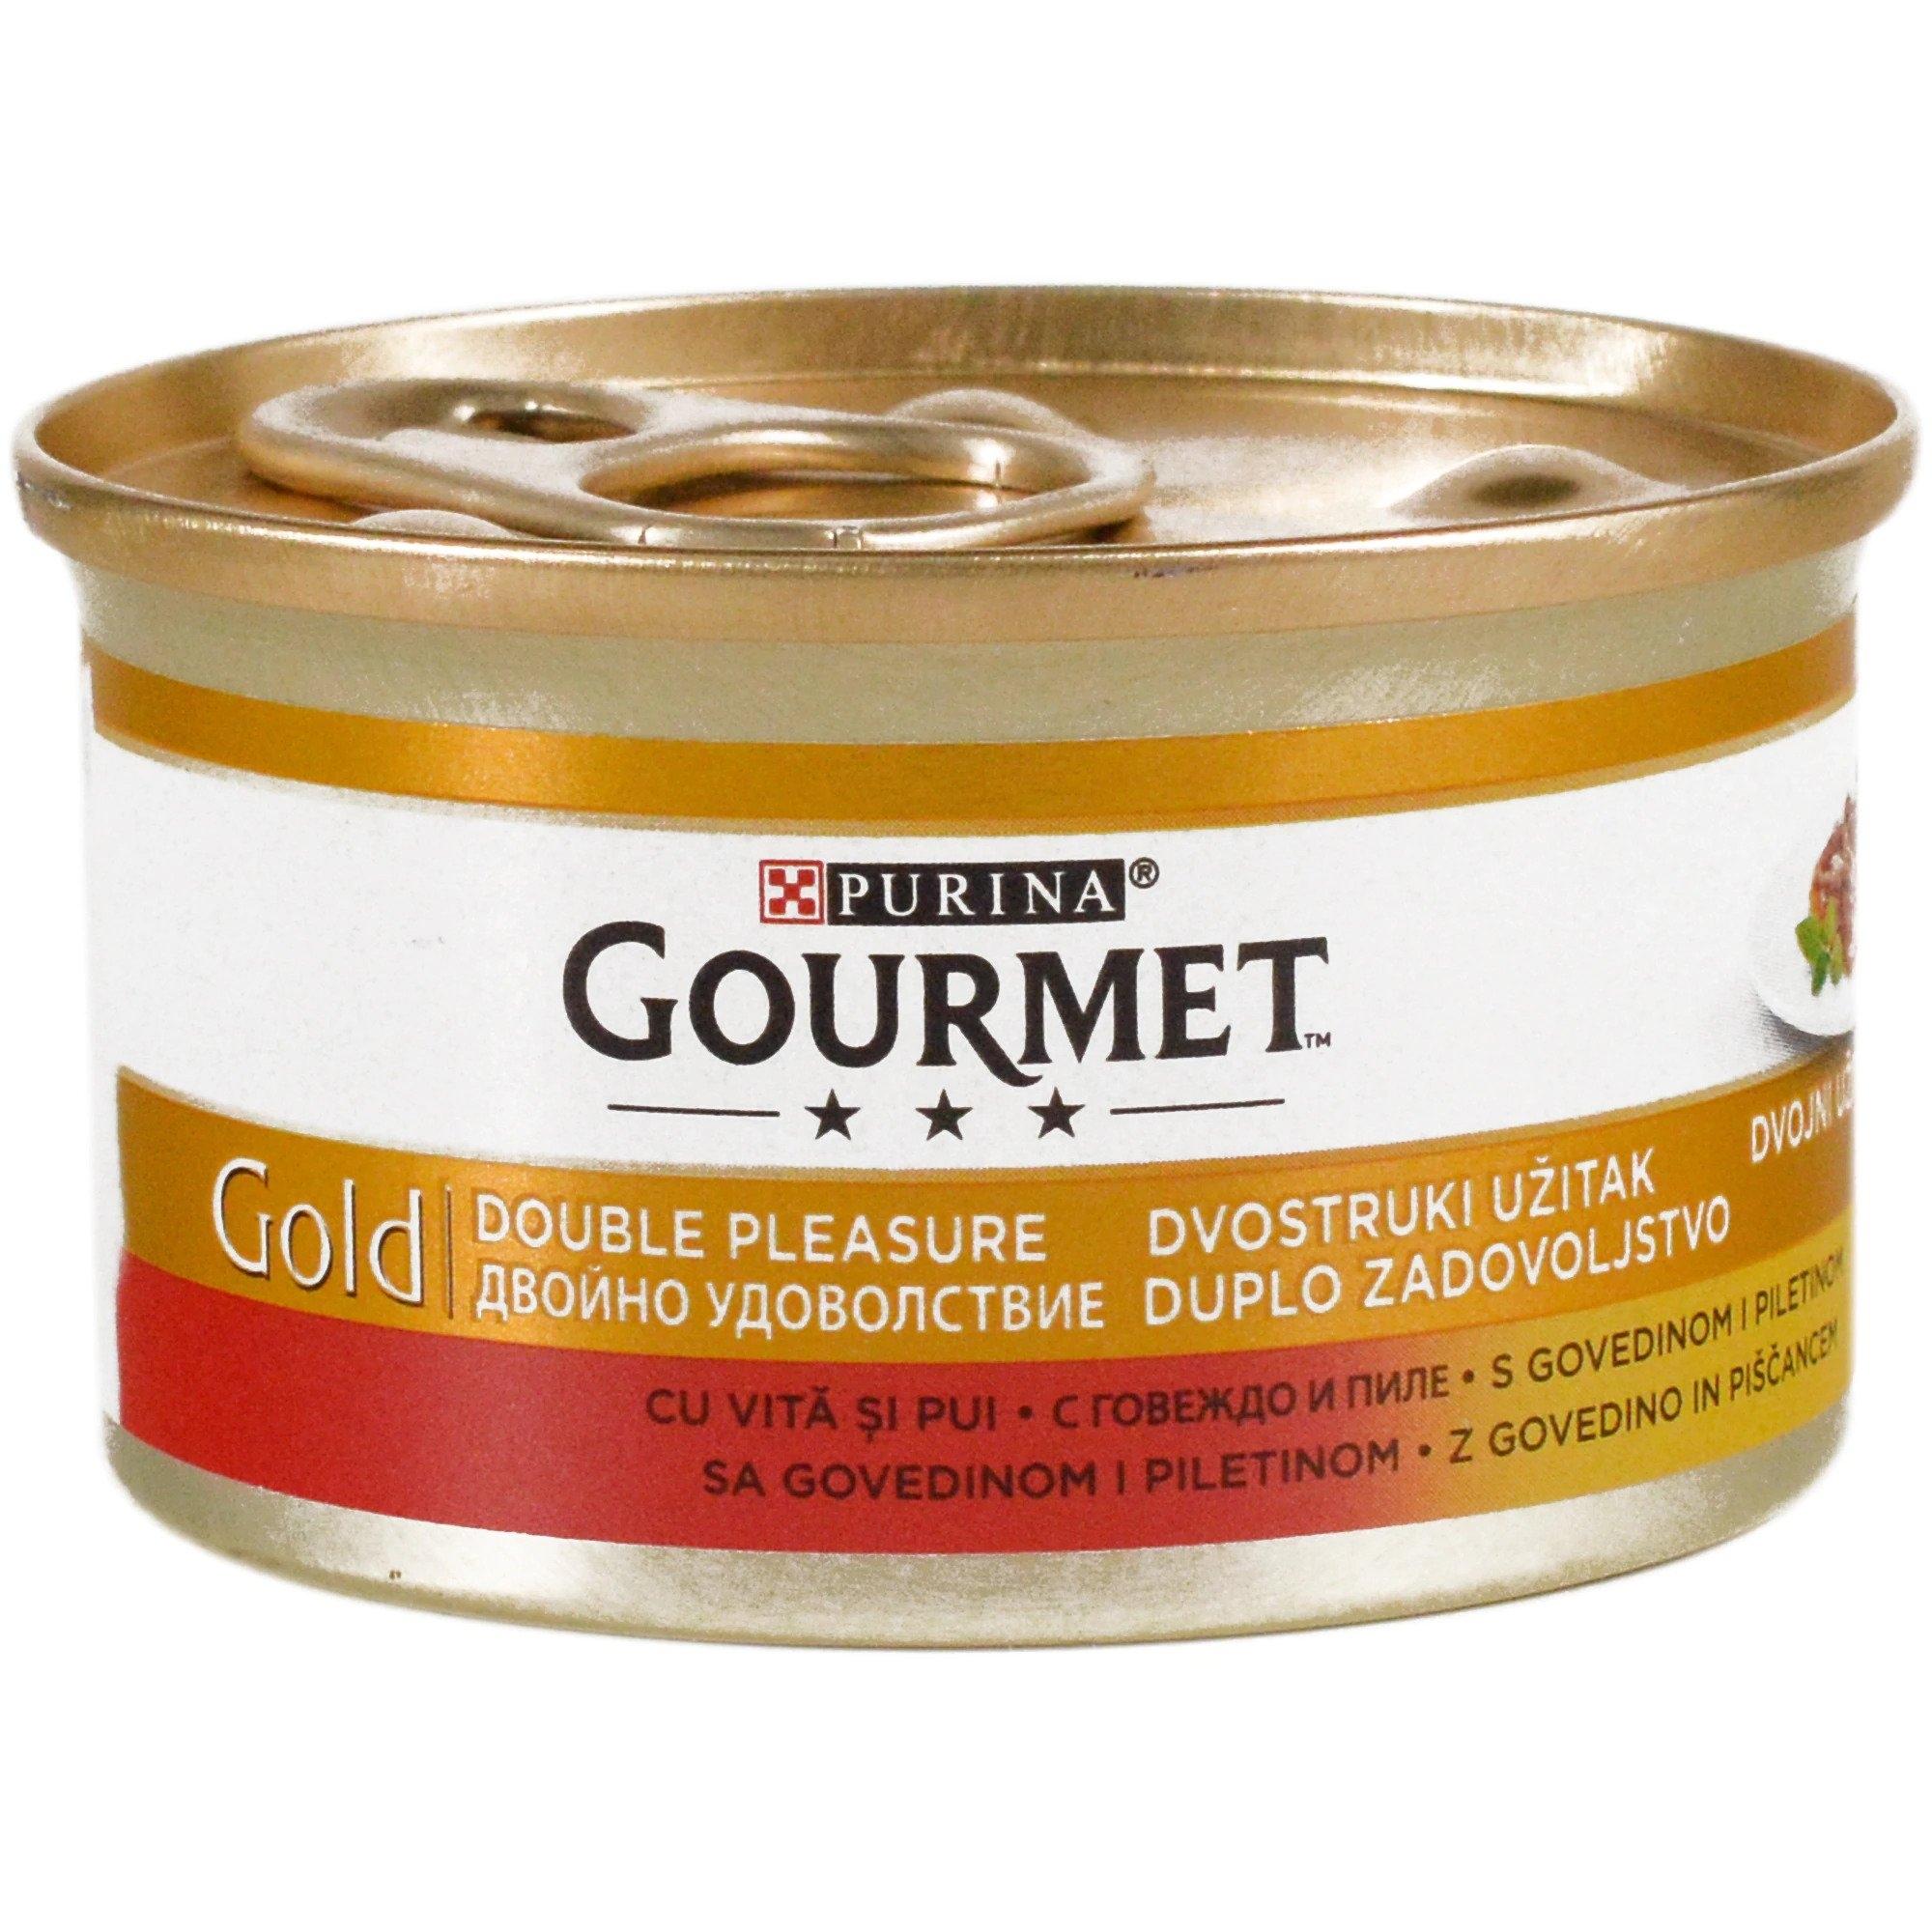 Gourmet Gold Double Pleasure, Vita si Pui, 85 g imagine